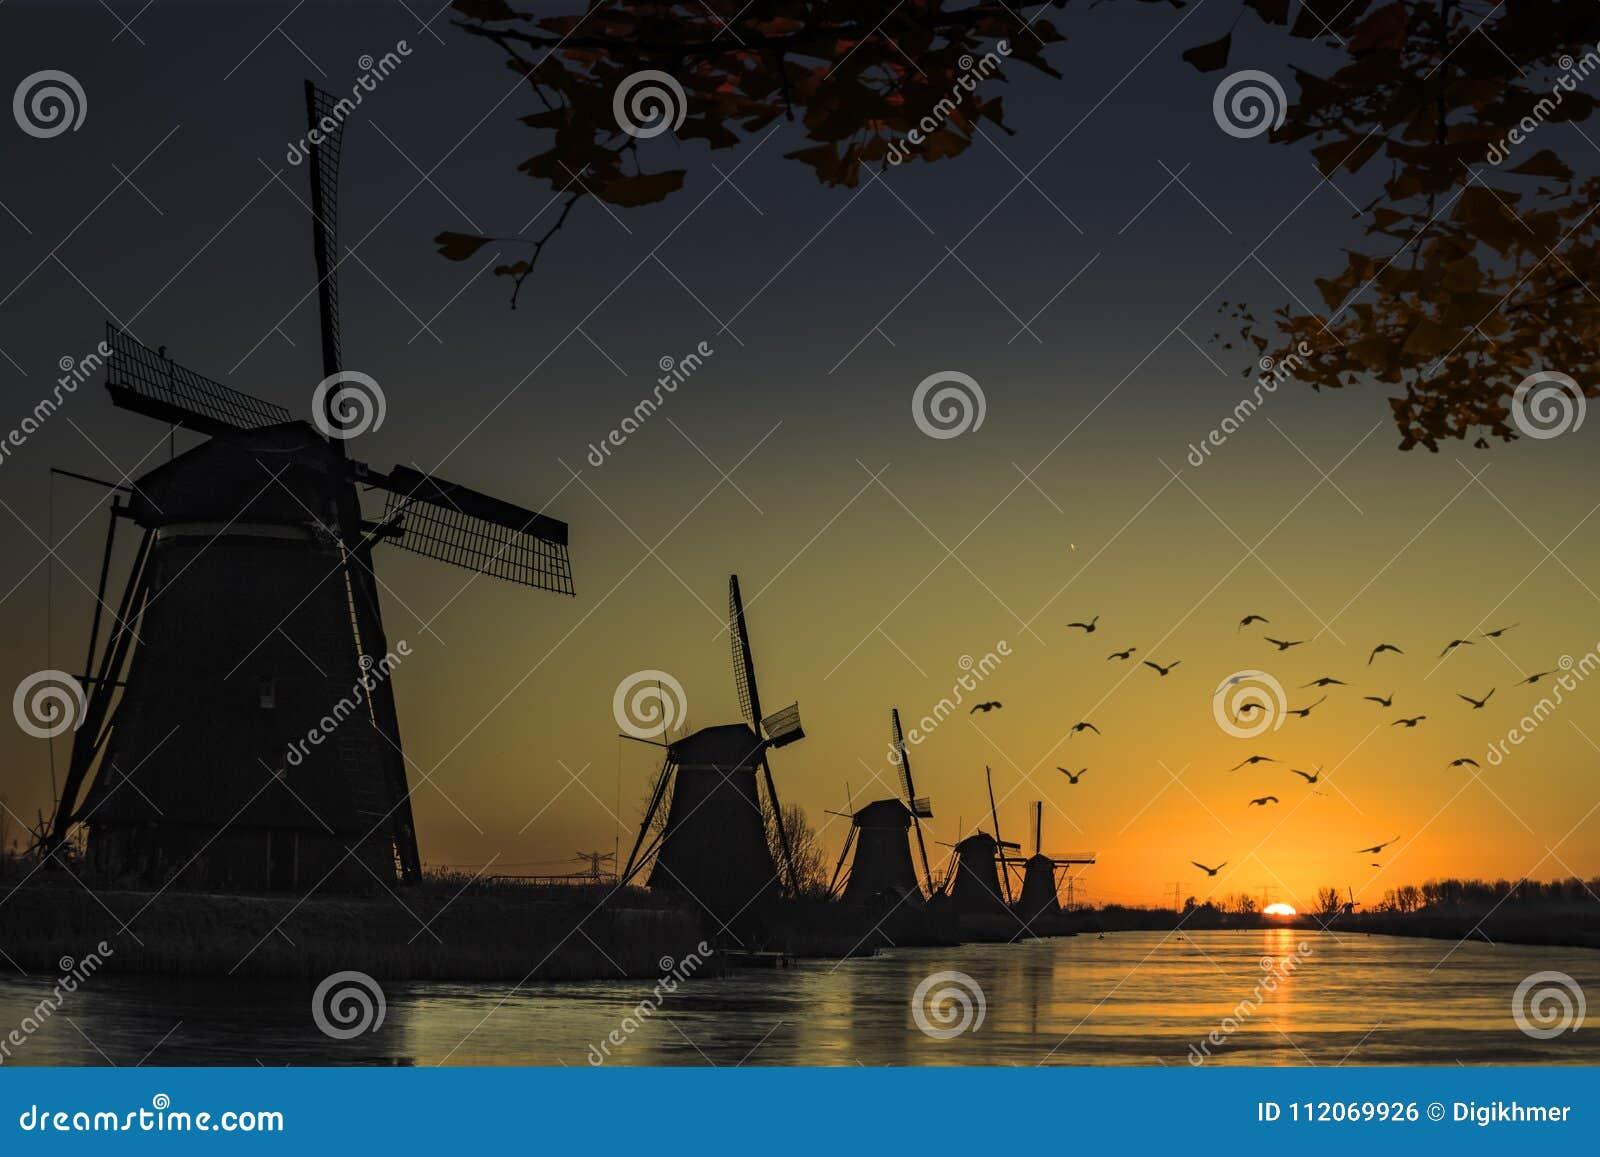 Windmill sunrise silhouette